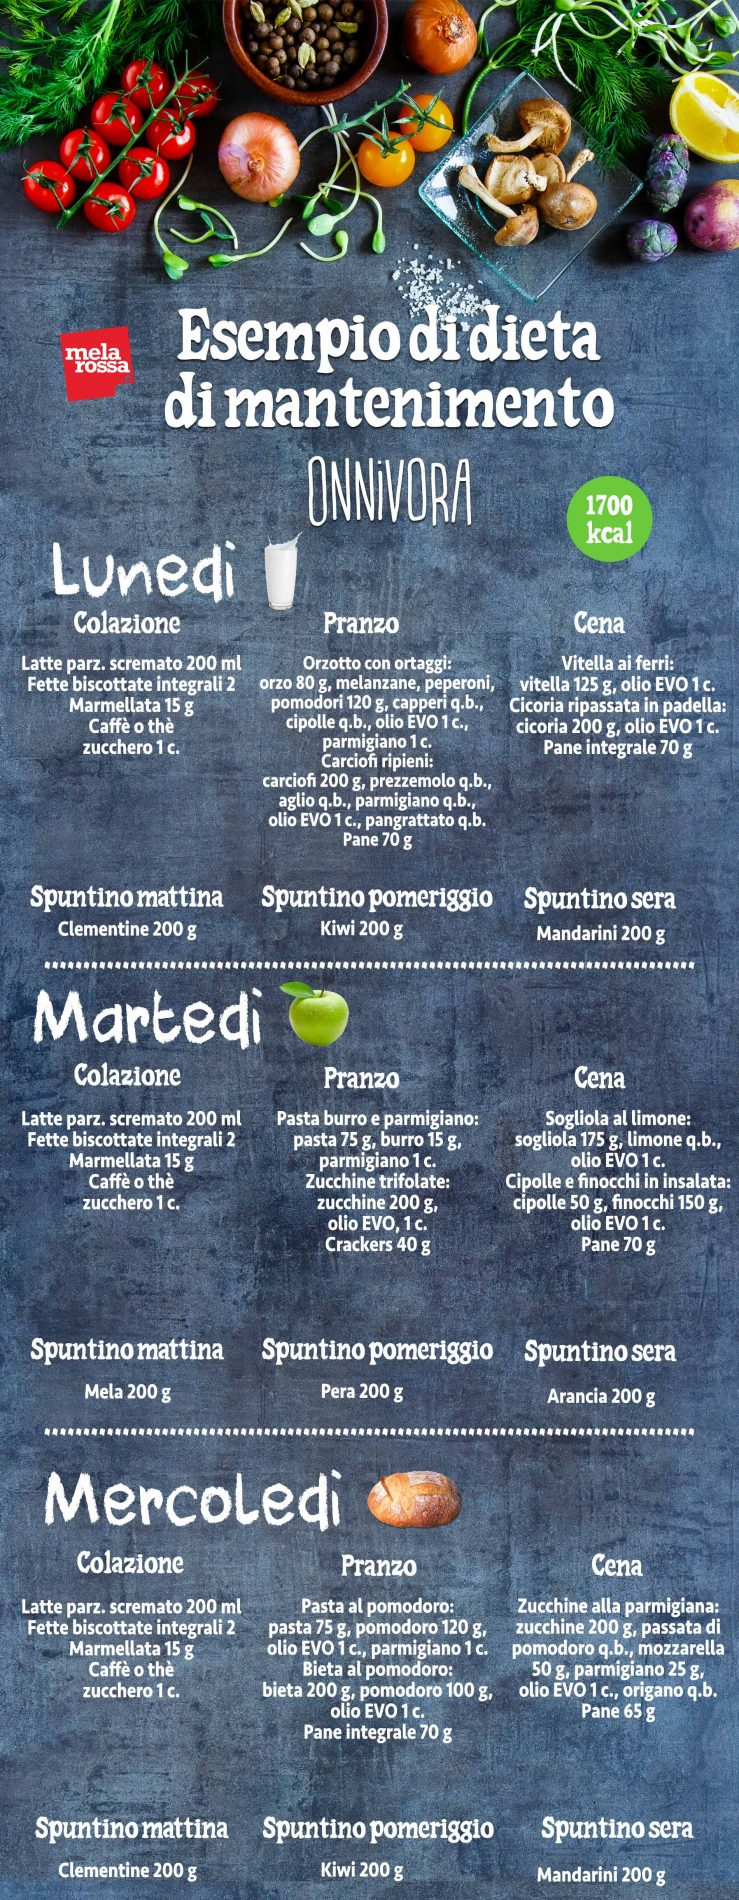 dieta mantenimento onnivora 1700 kcal parte 1